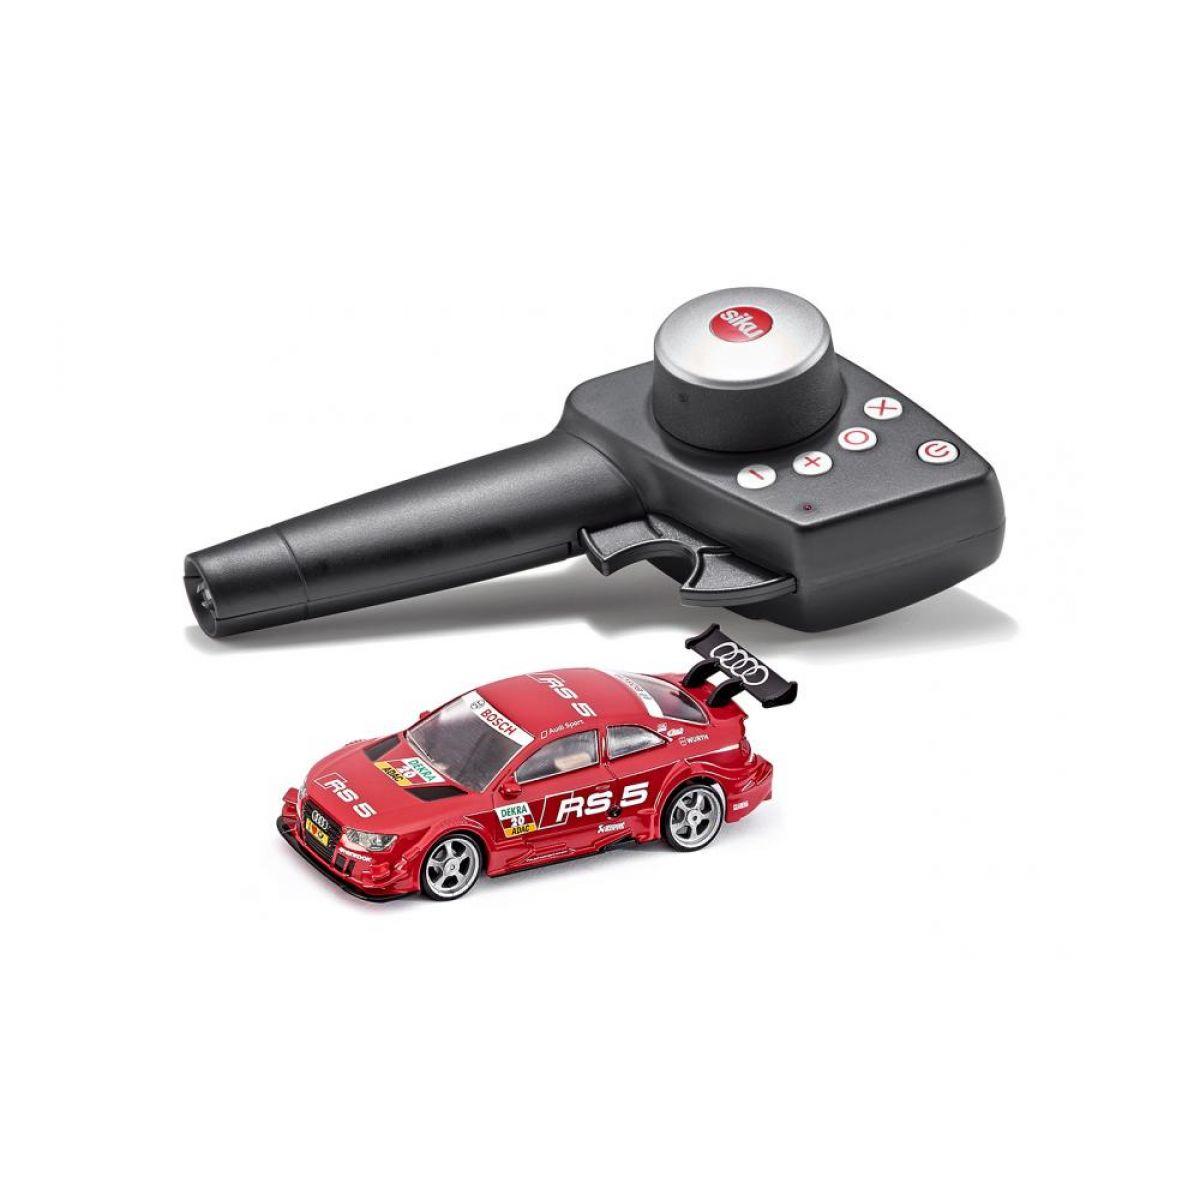 Siku Racing Audi RS5 s dálk. ovladačem a baterií 1:43